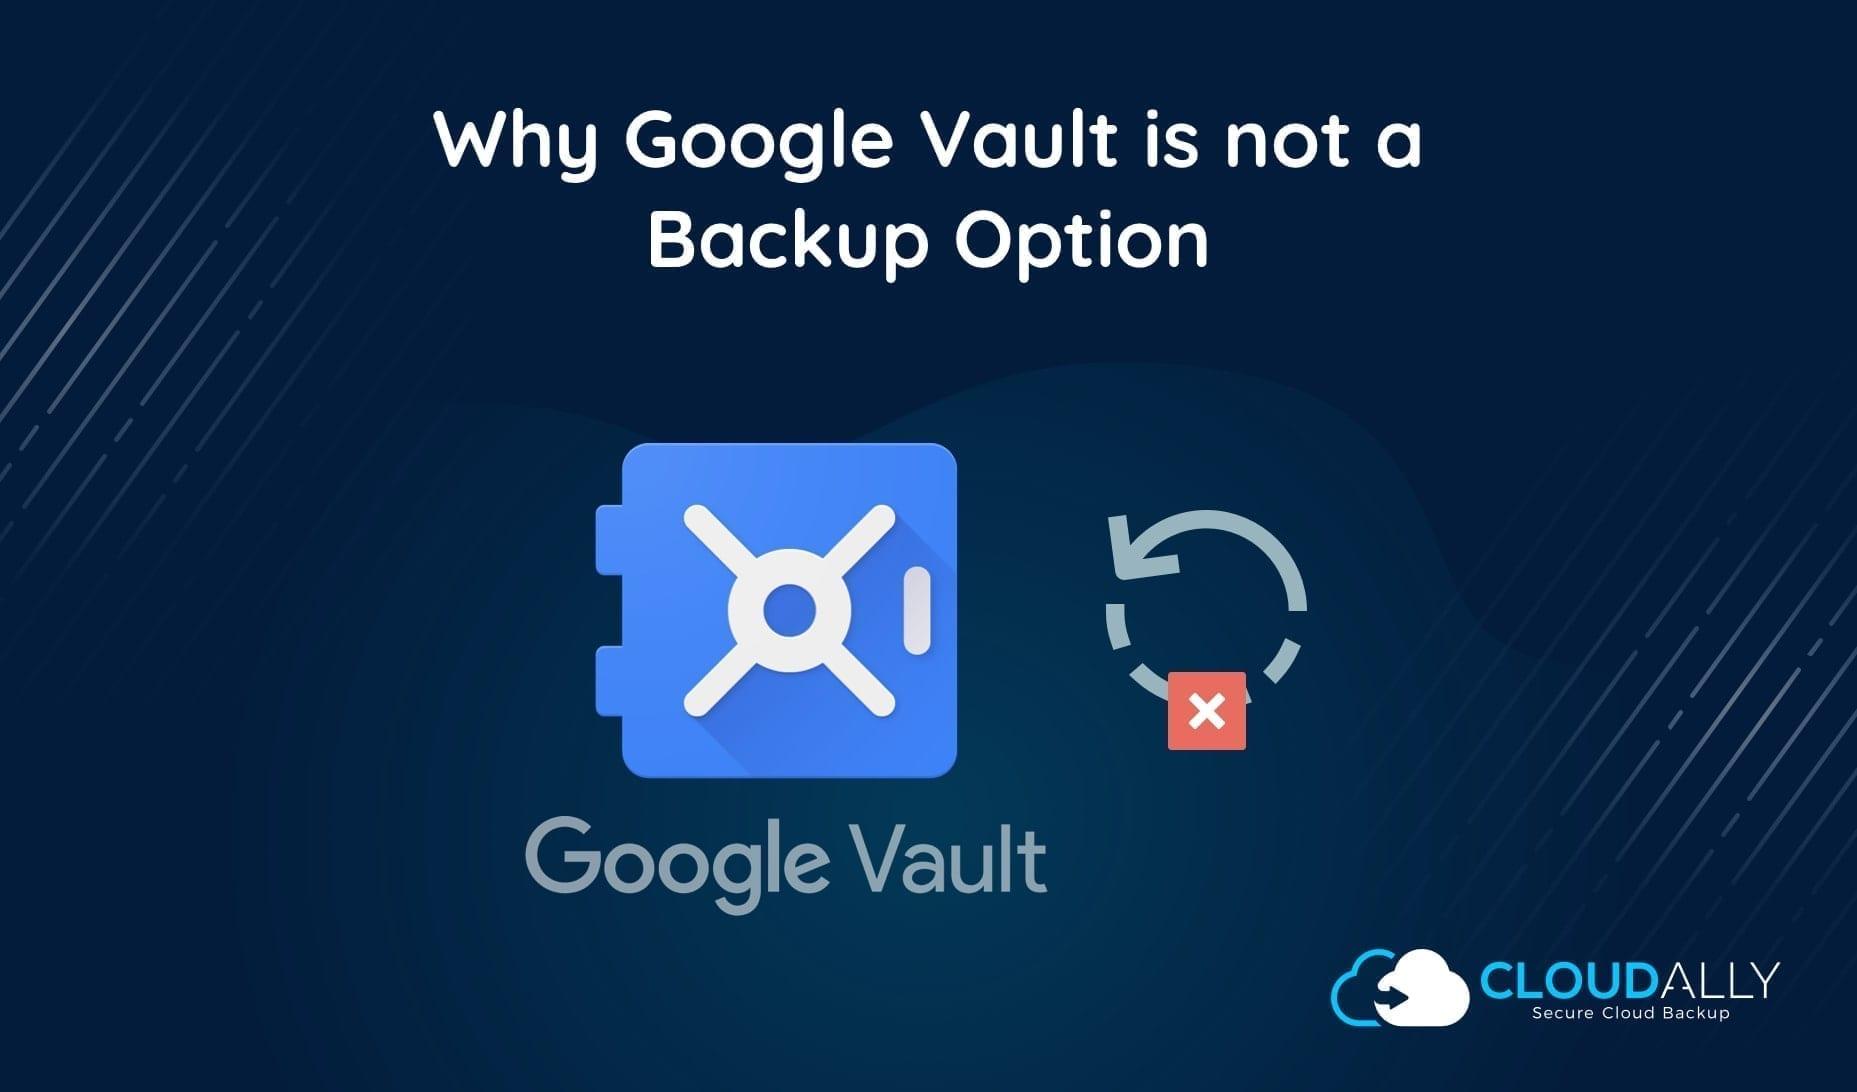 Google Vault Backup solutions